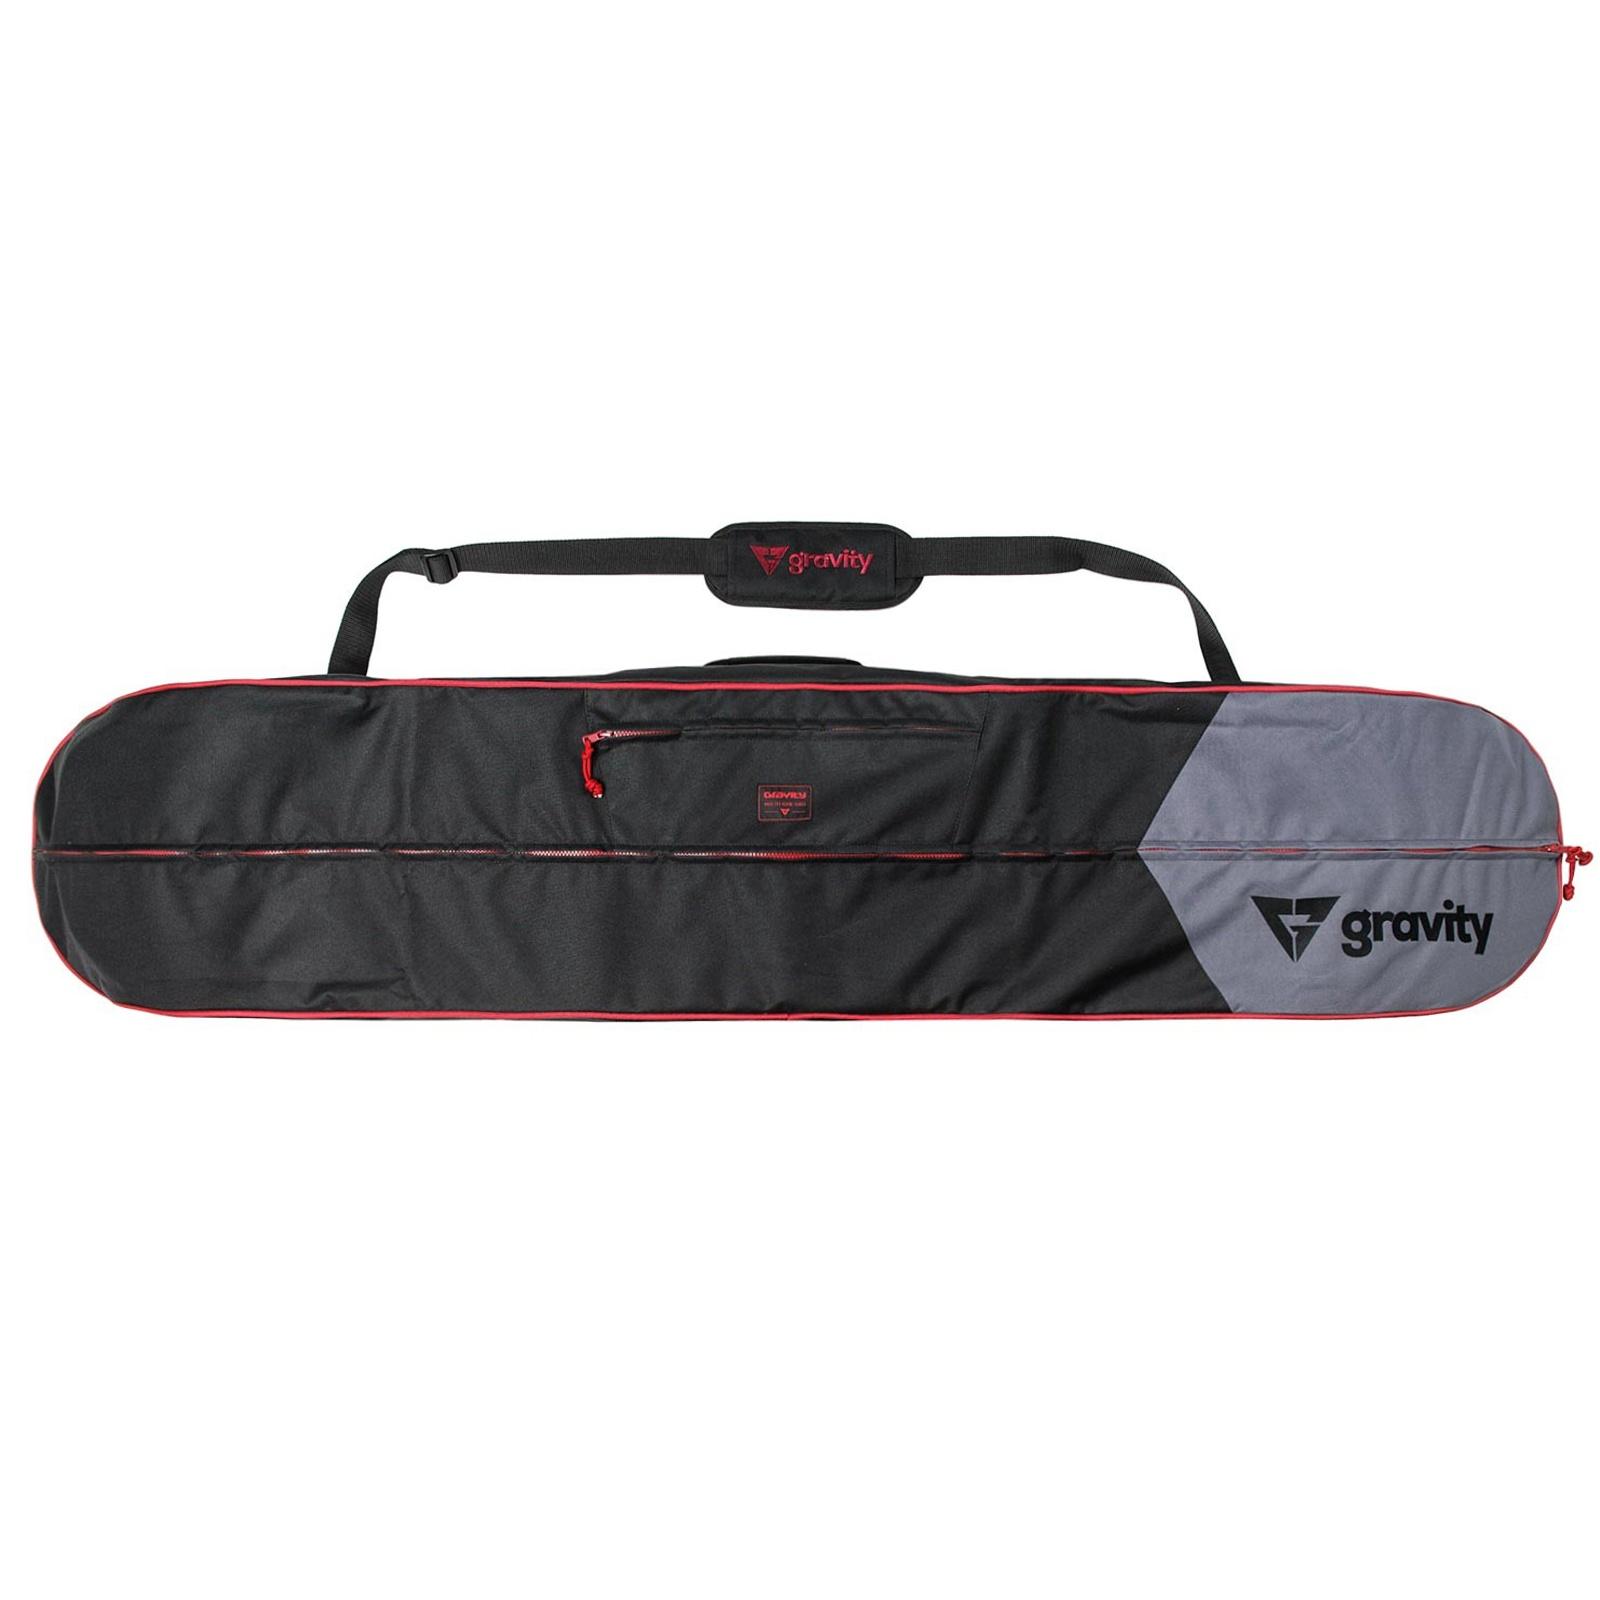 Obal na snowboard GRAVITY Icon černo-červený - vel. 165 cm